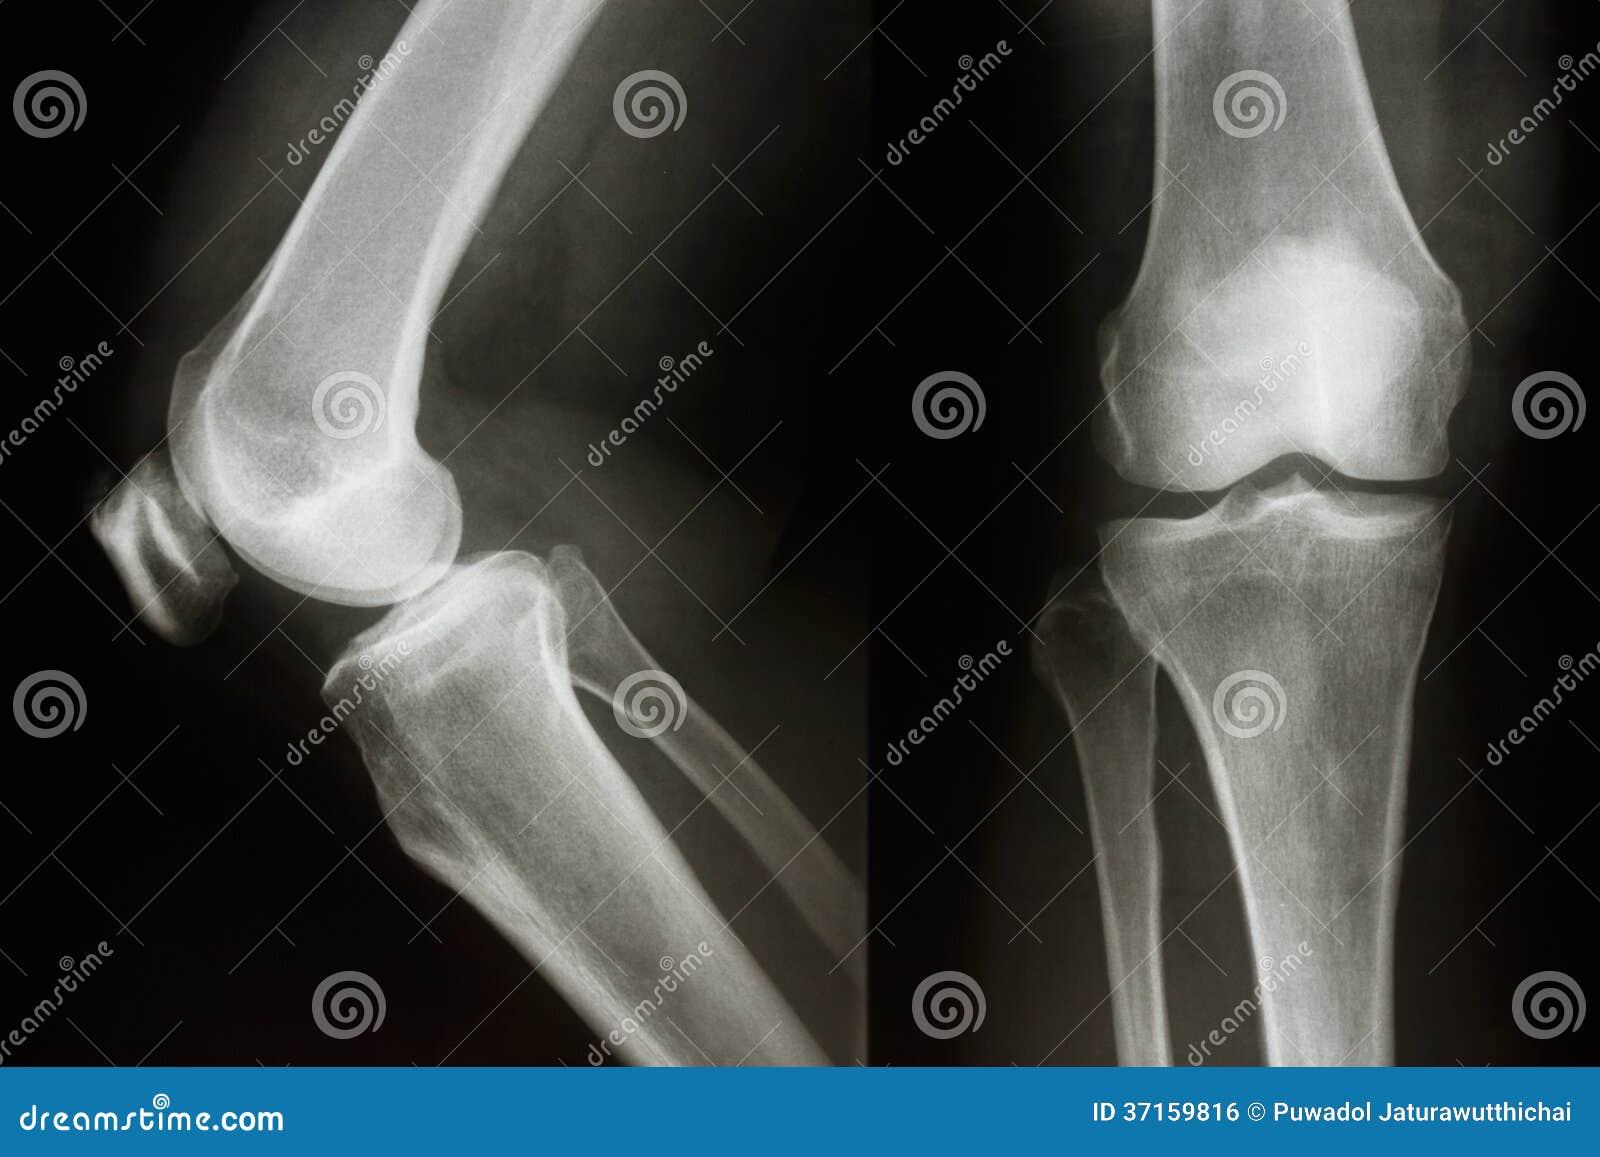 normal knee joint royalty free stock image image 37159816. Black Bedroom Furniture Sets. Home Design Ideas